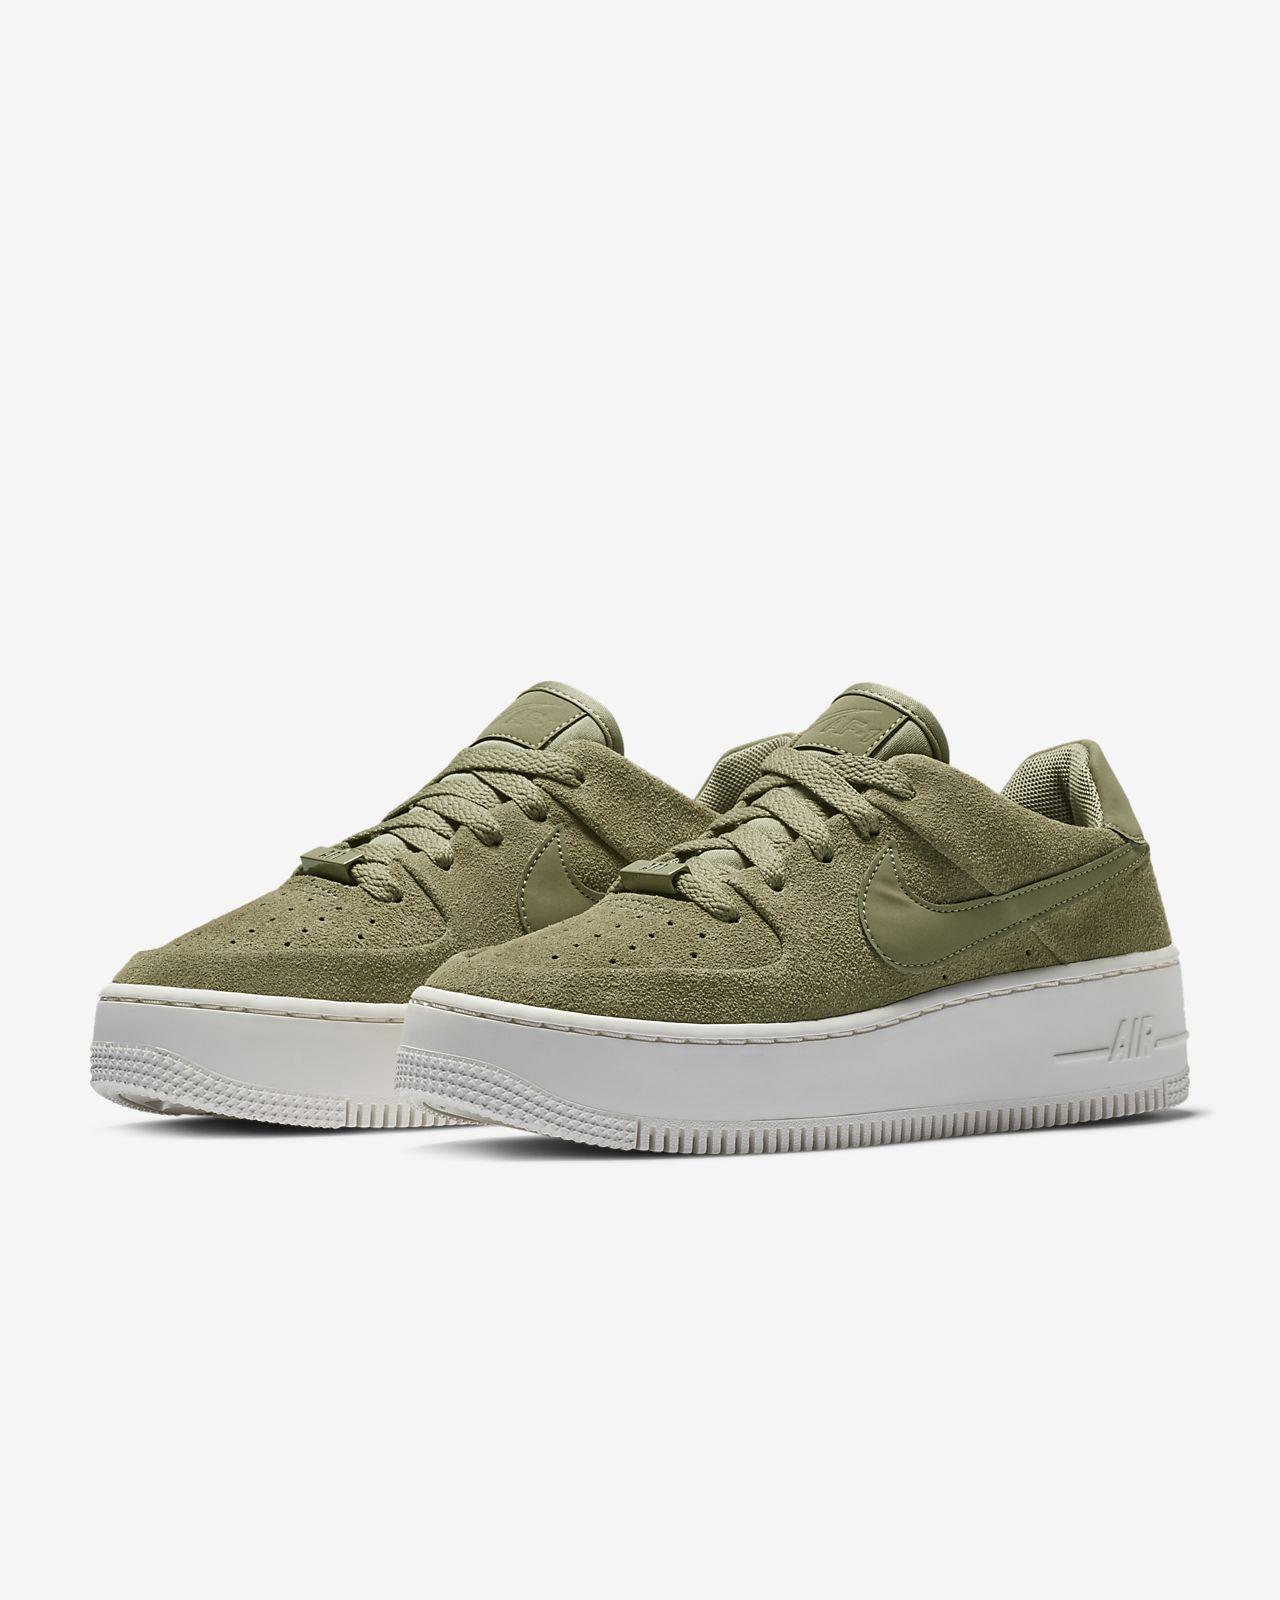 29939f44c Nike Air Force 1 Sage Low Women s Shoe. Nike.com SE